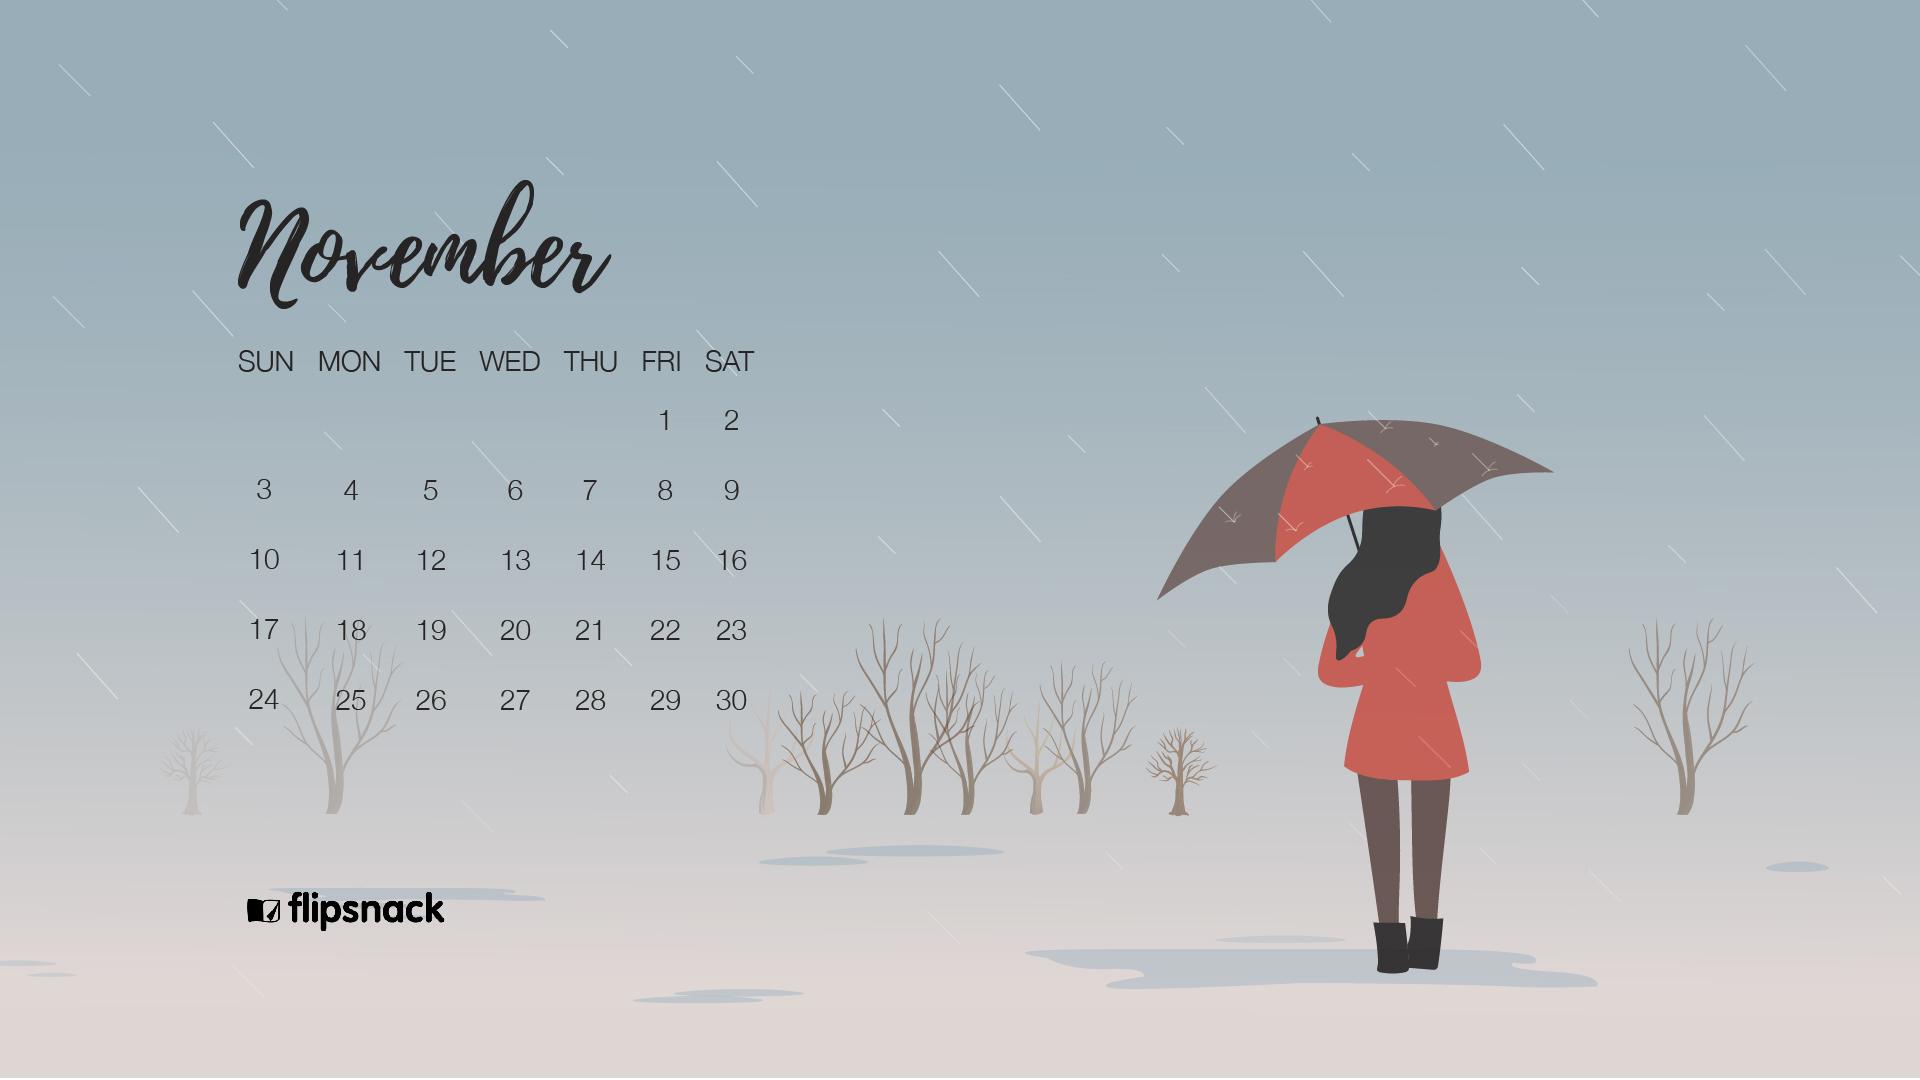 November 2019 wallpaper calendar rain